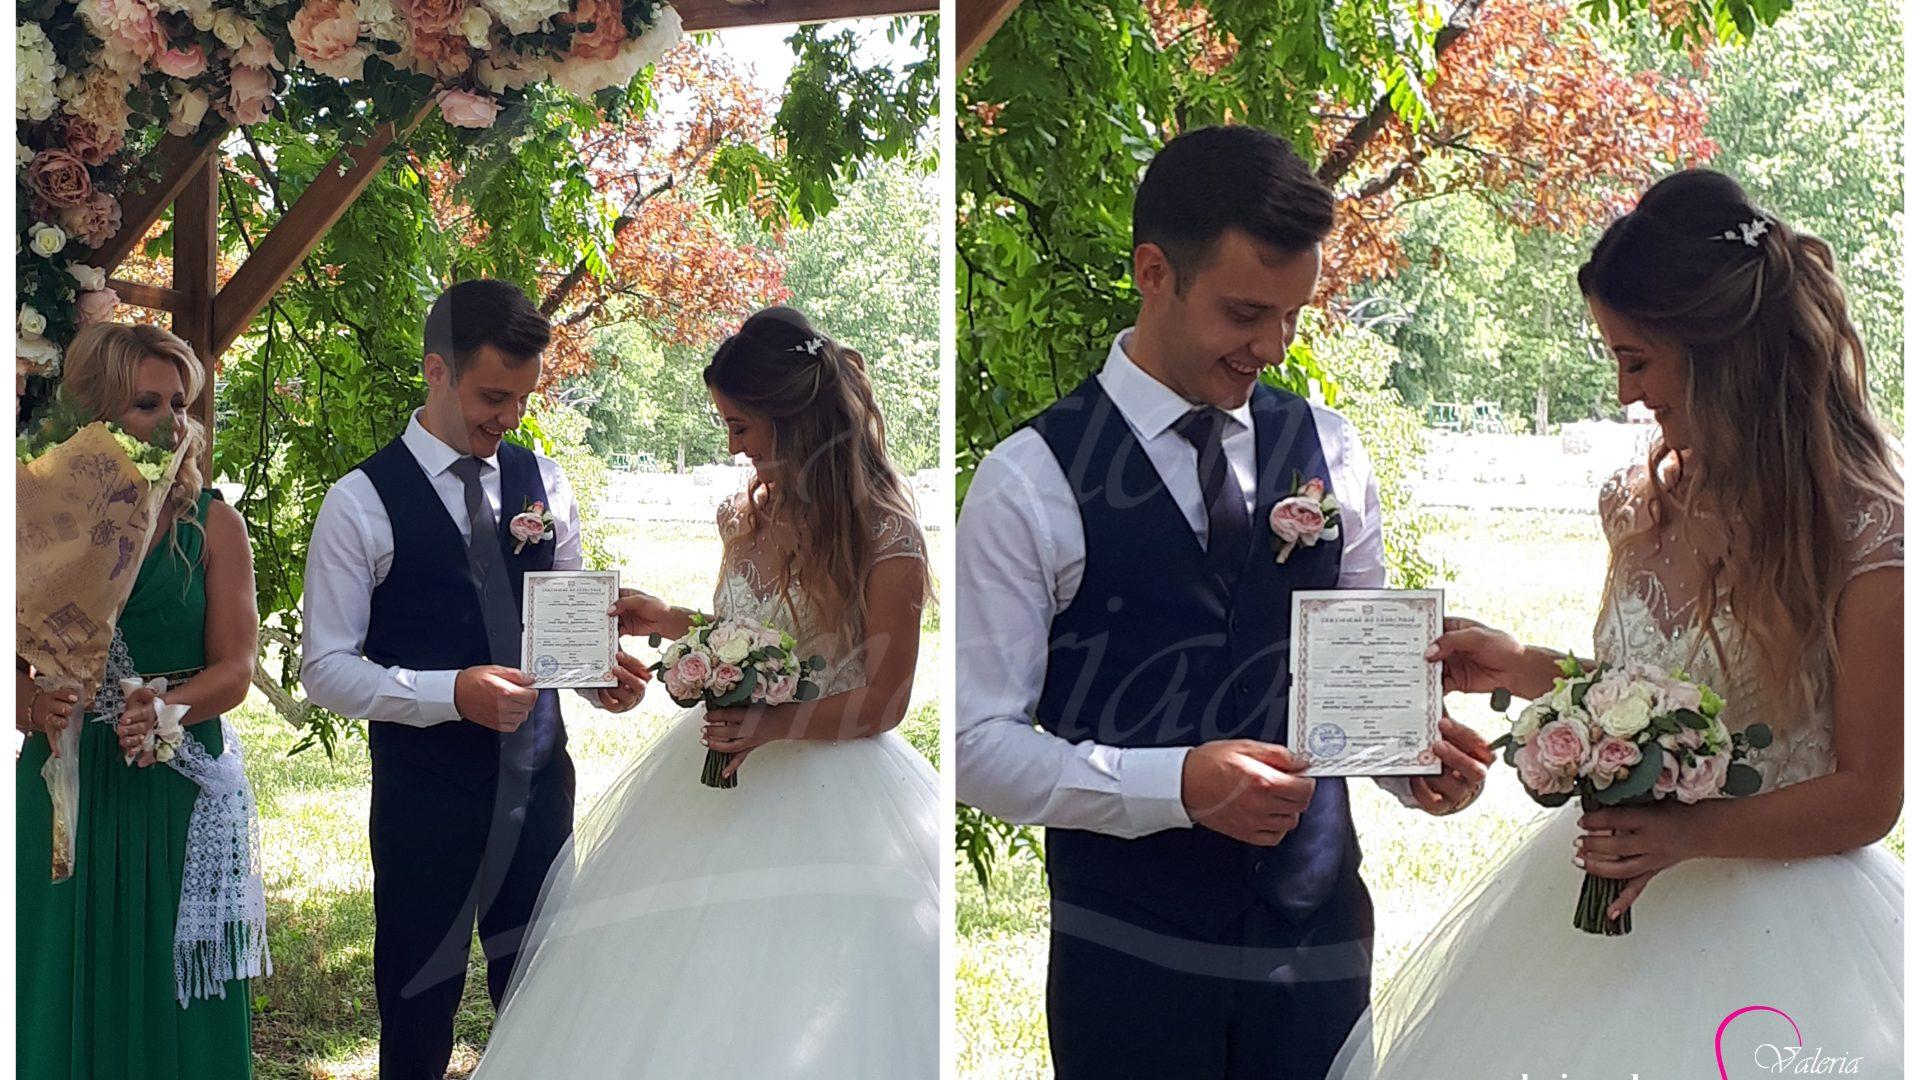 Inregistrarea casatoriei sub cerul liber Agentia Valeria Mariage 069787665 www.valeria (24)